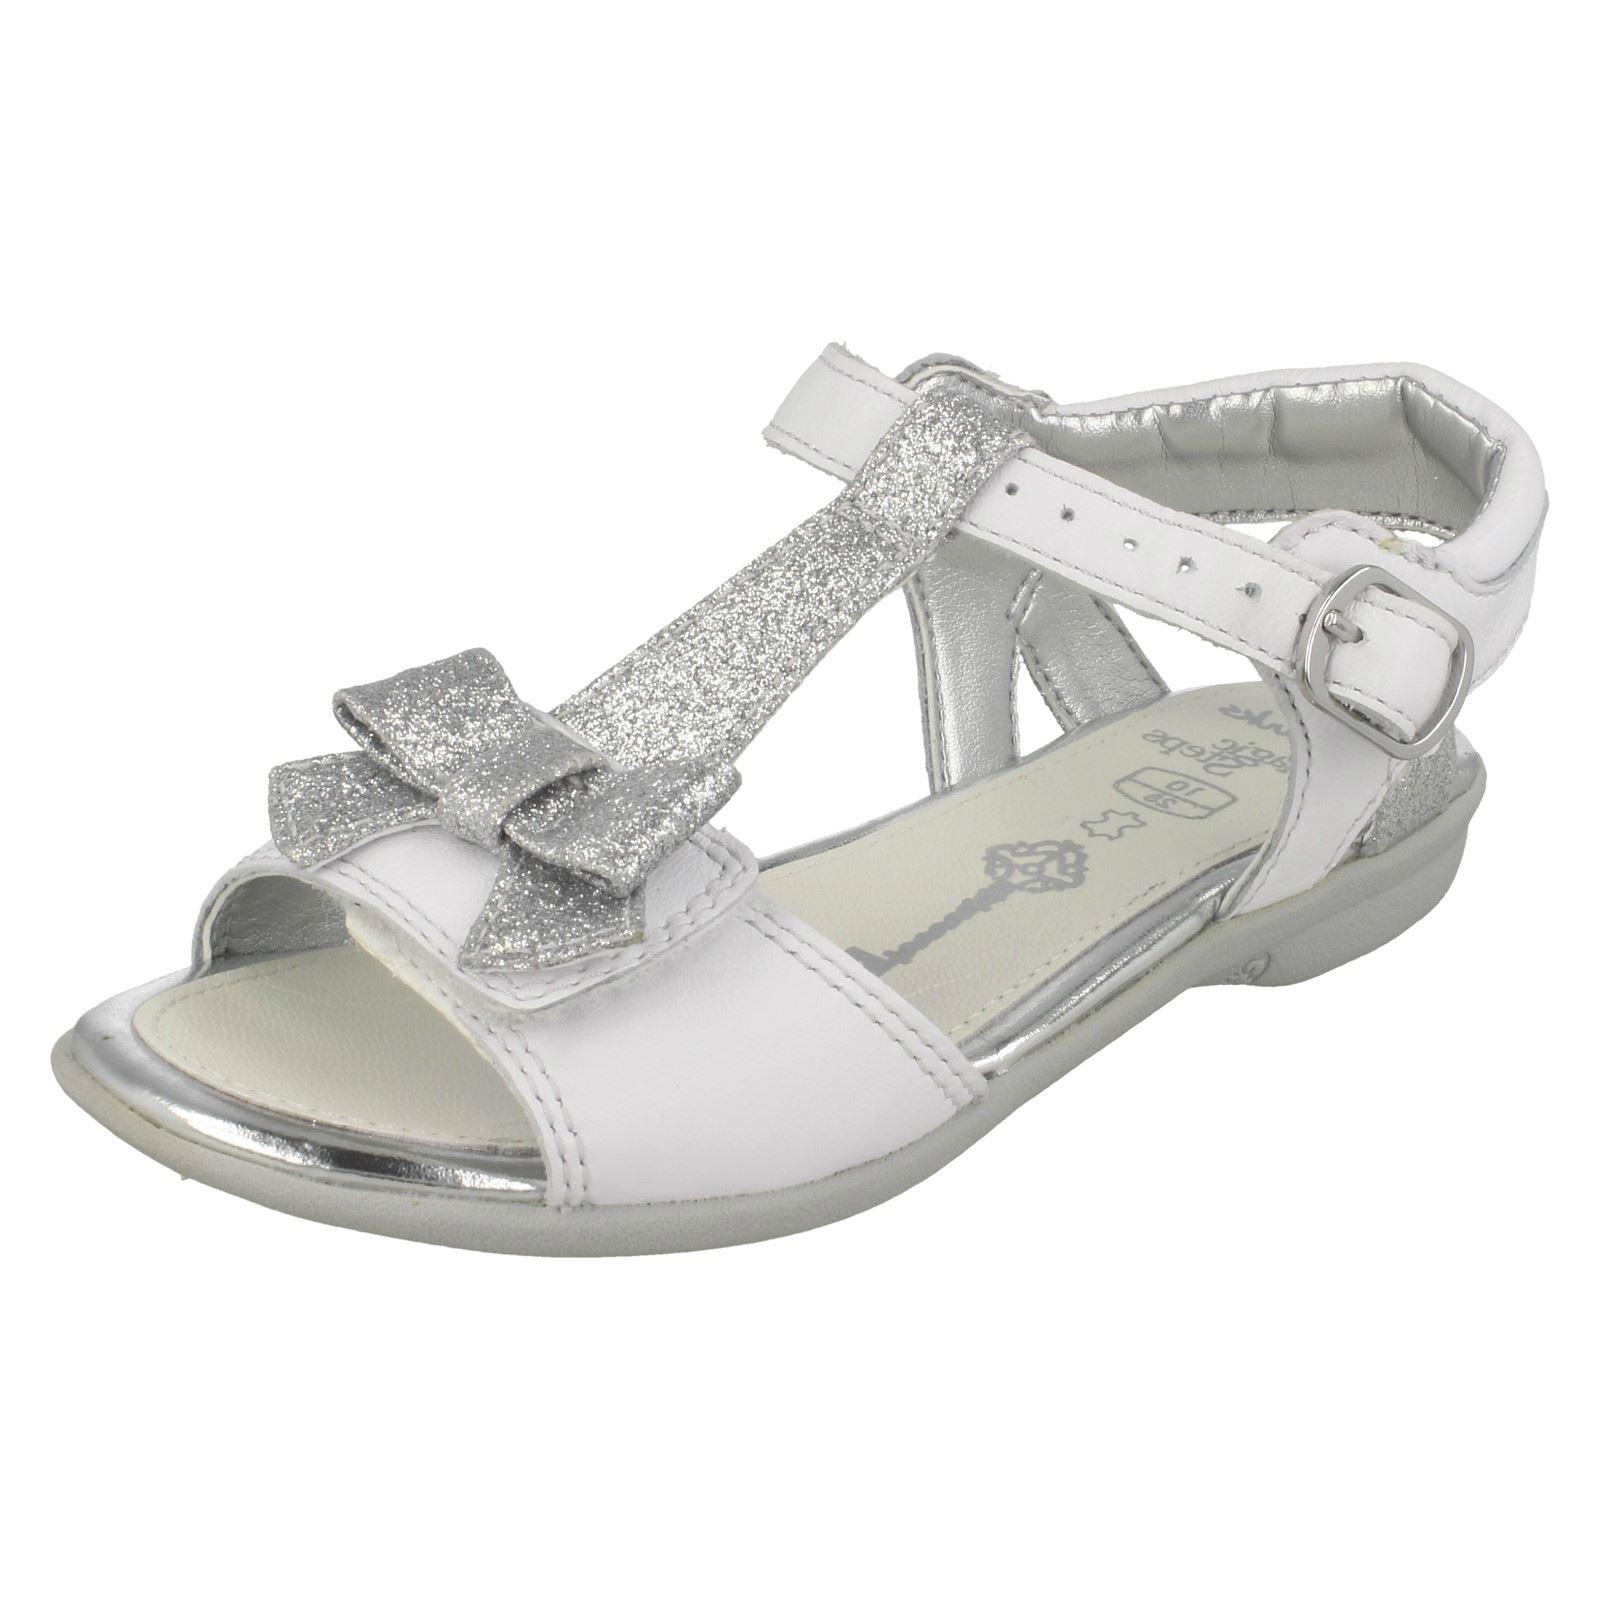 Girls Clarks Sandals 'Orra Noon'   eBay